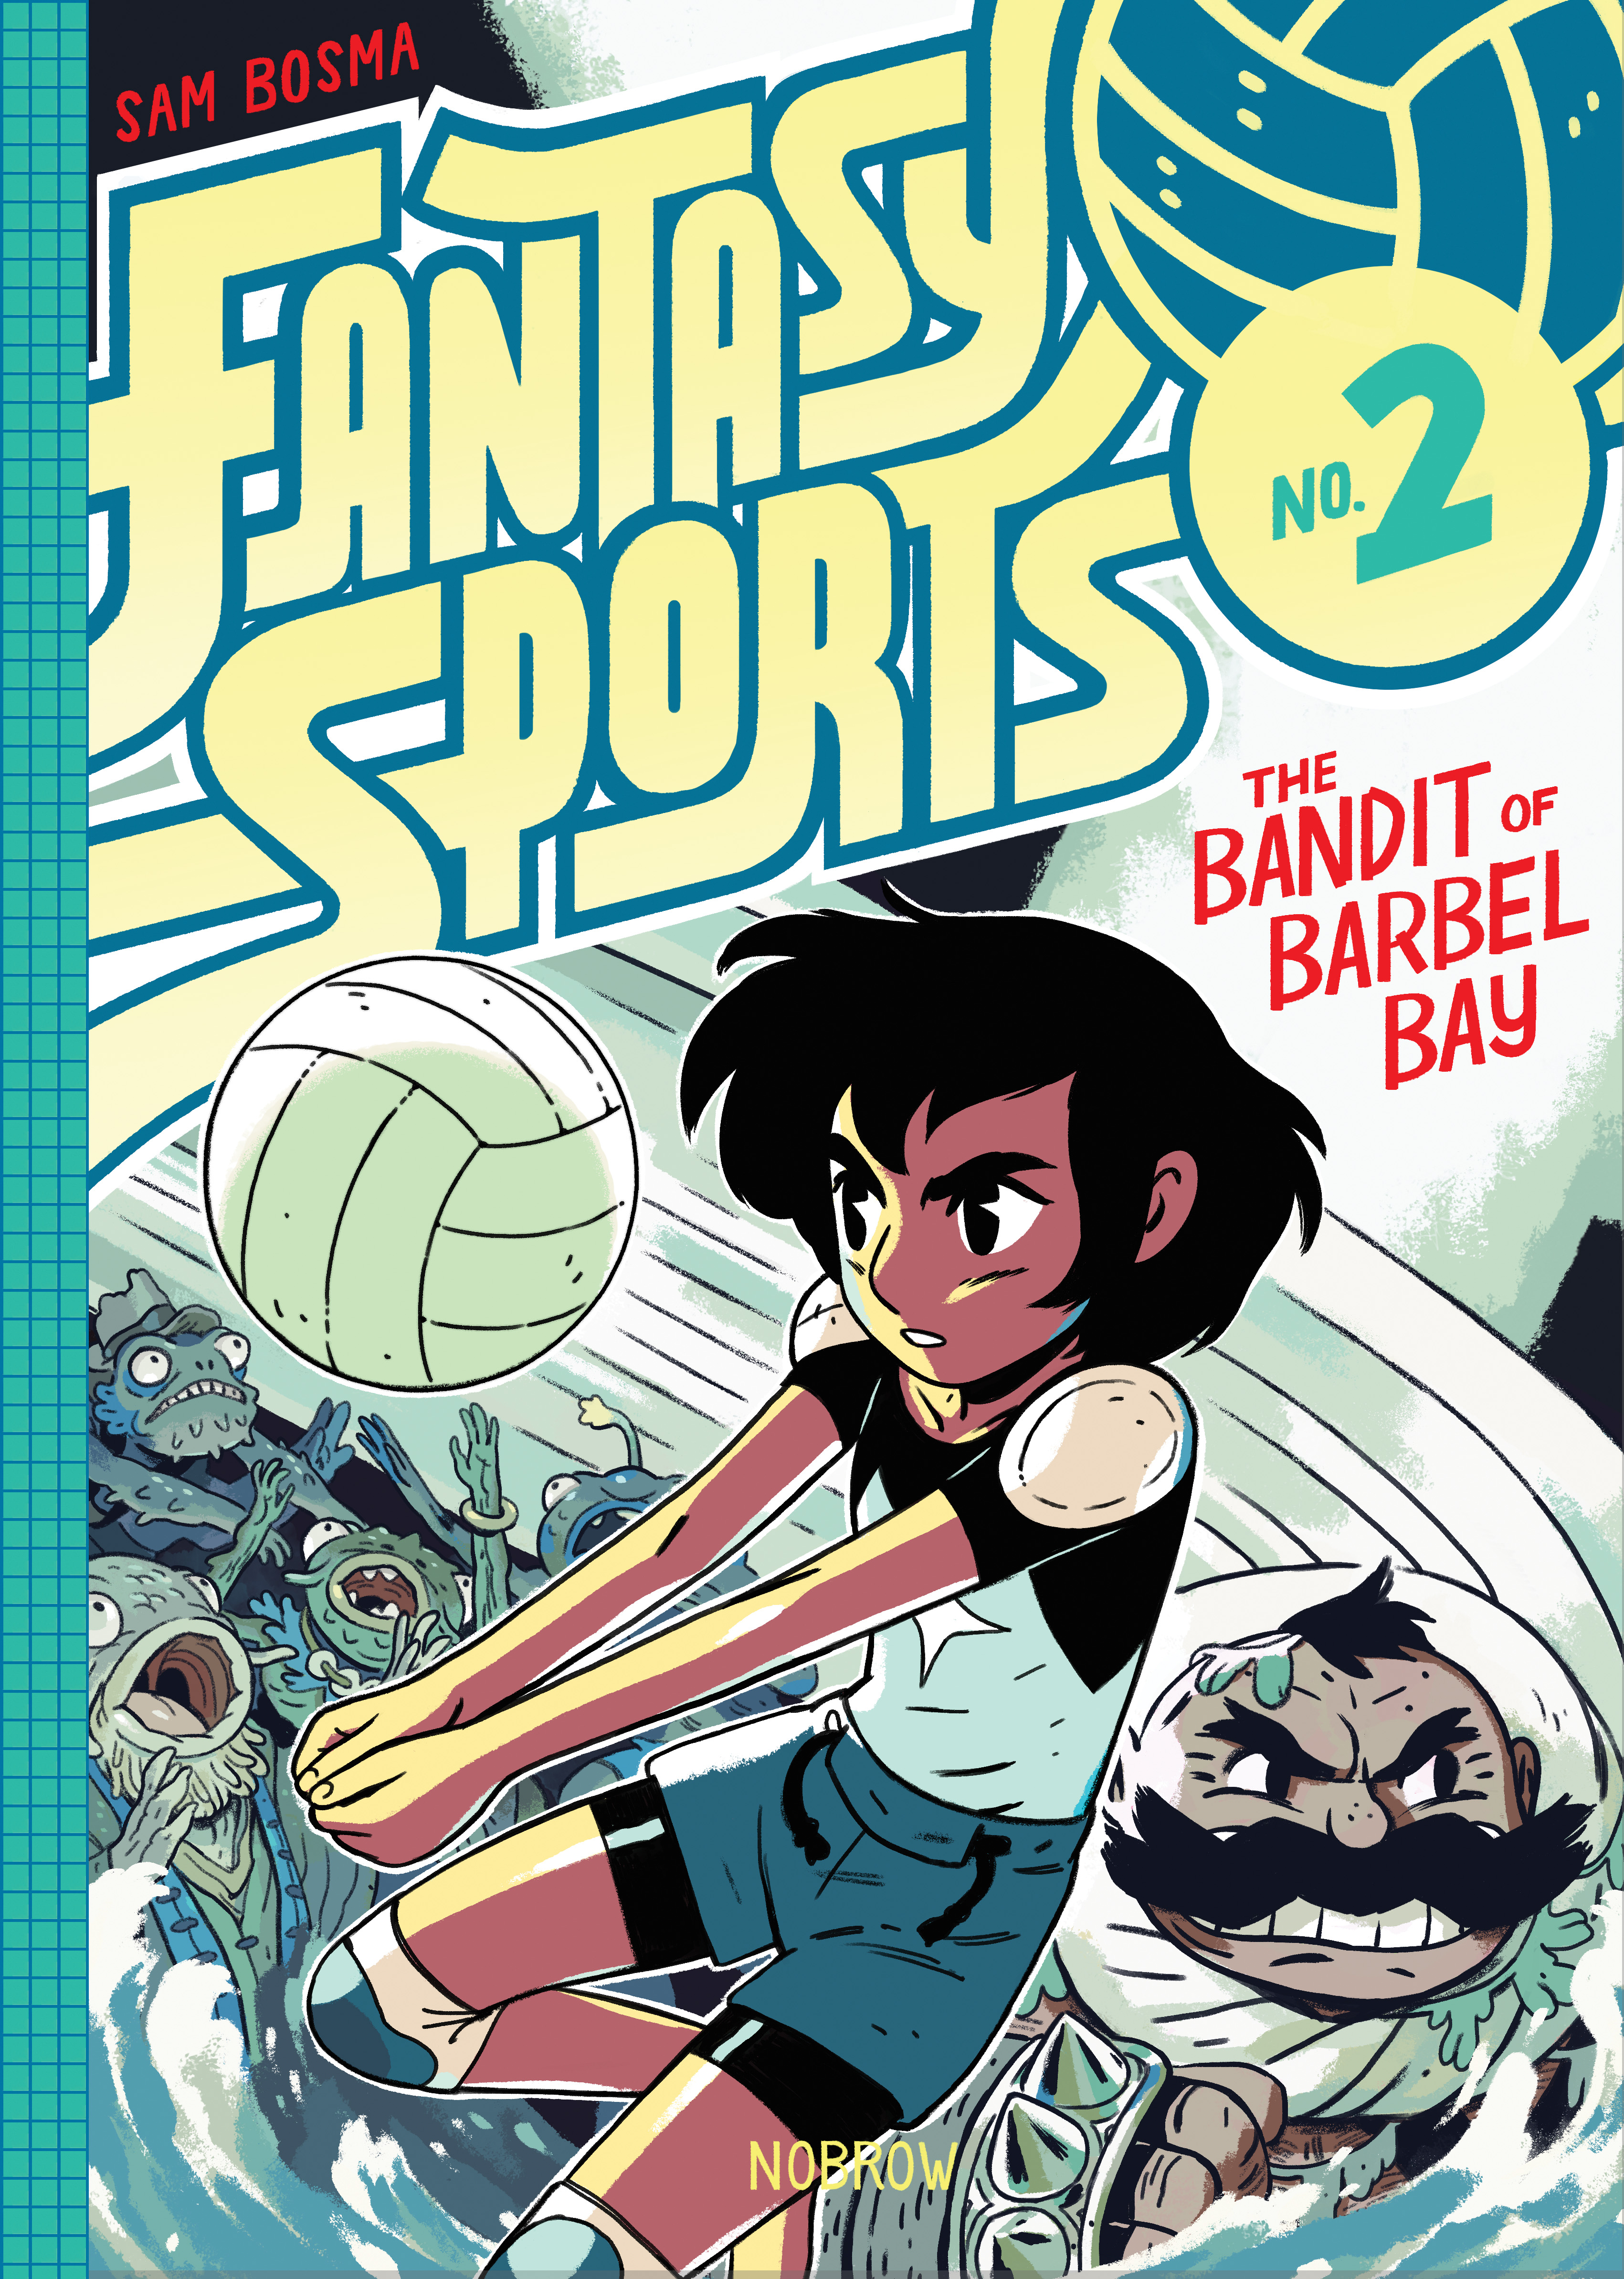 Fantasy Sports Volume 2: The Bandit of Barbel Bay - Cover